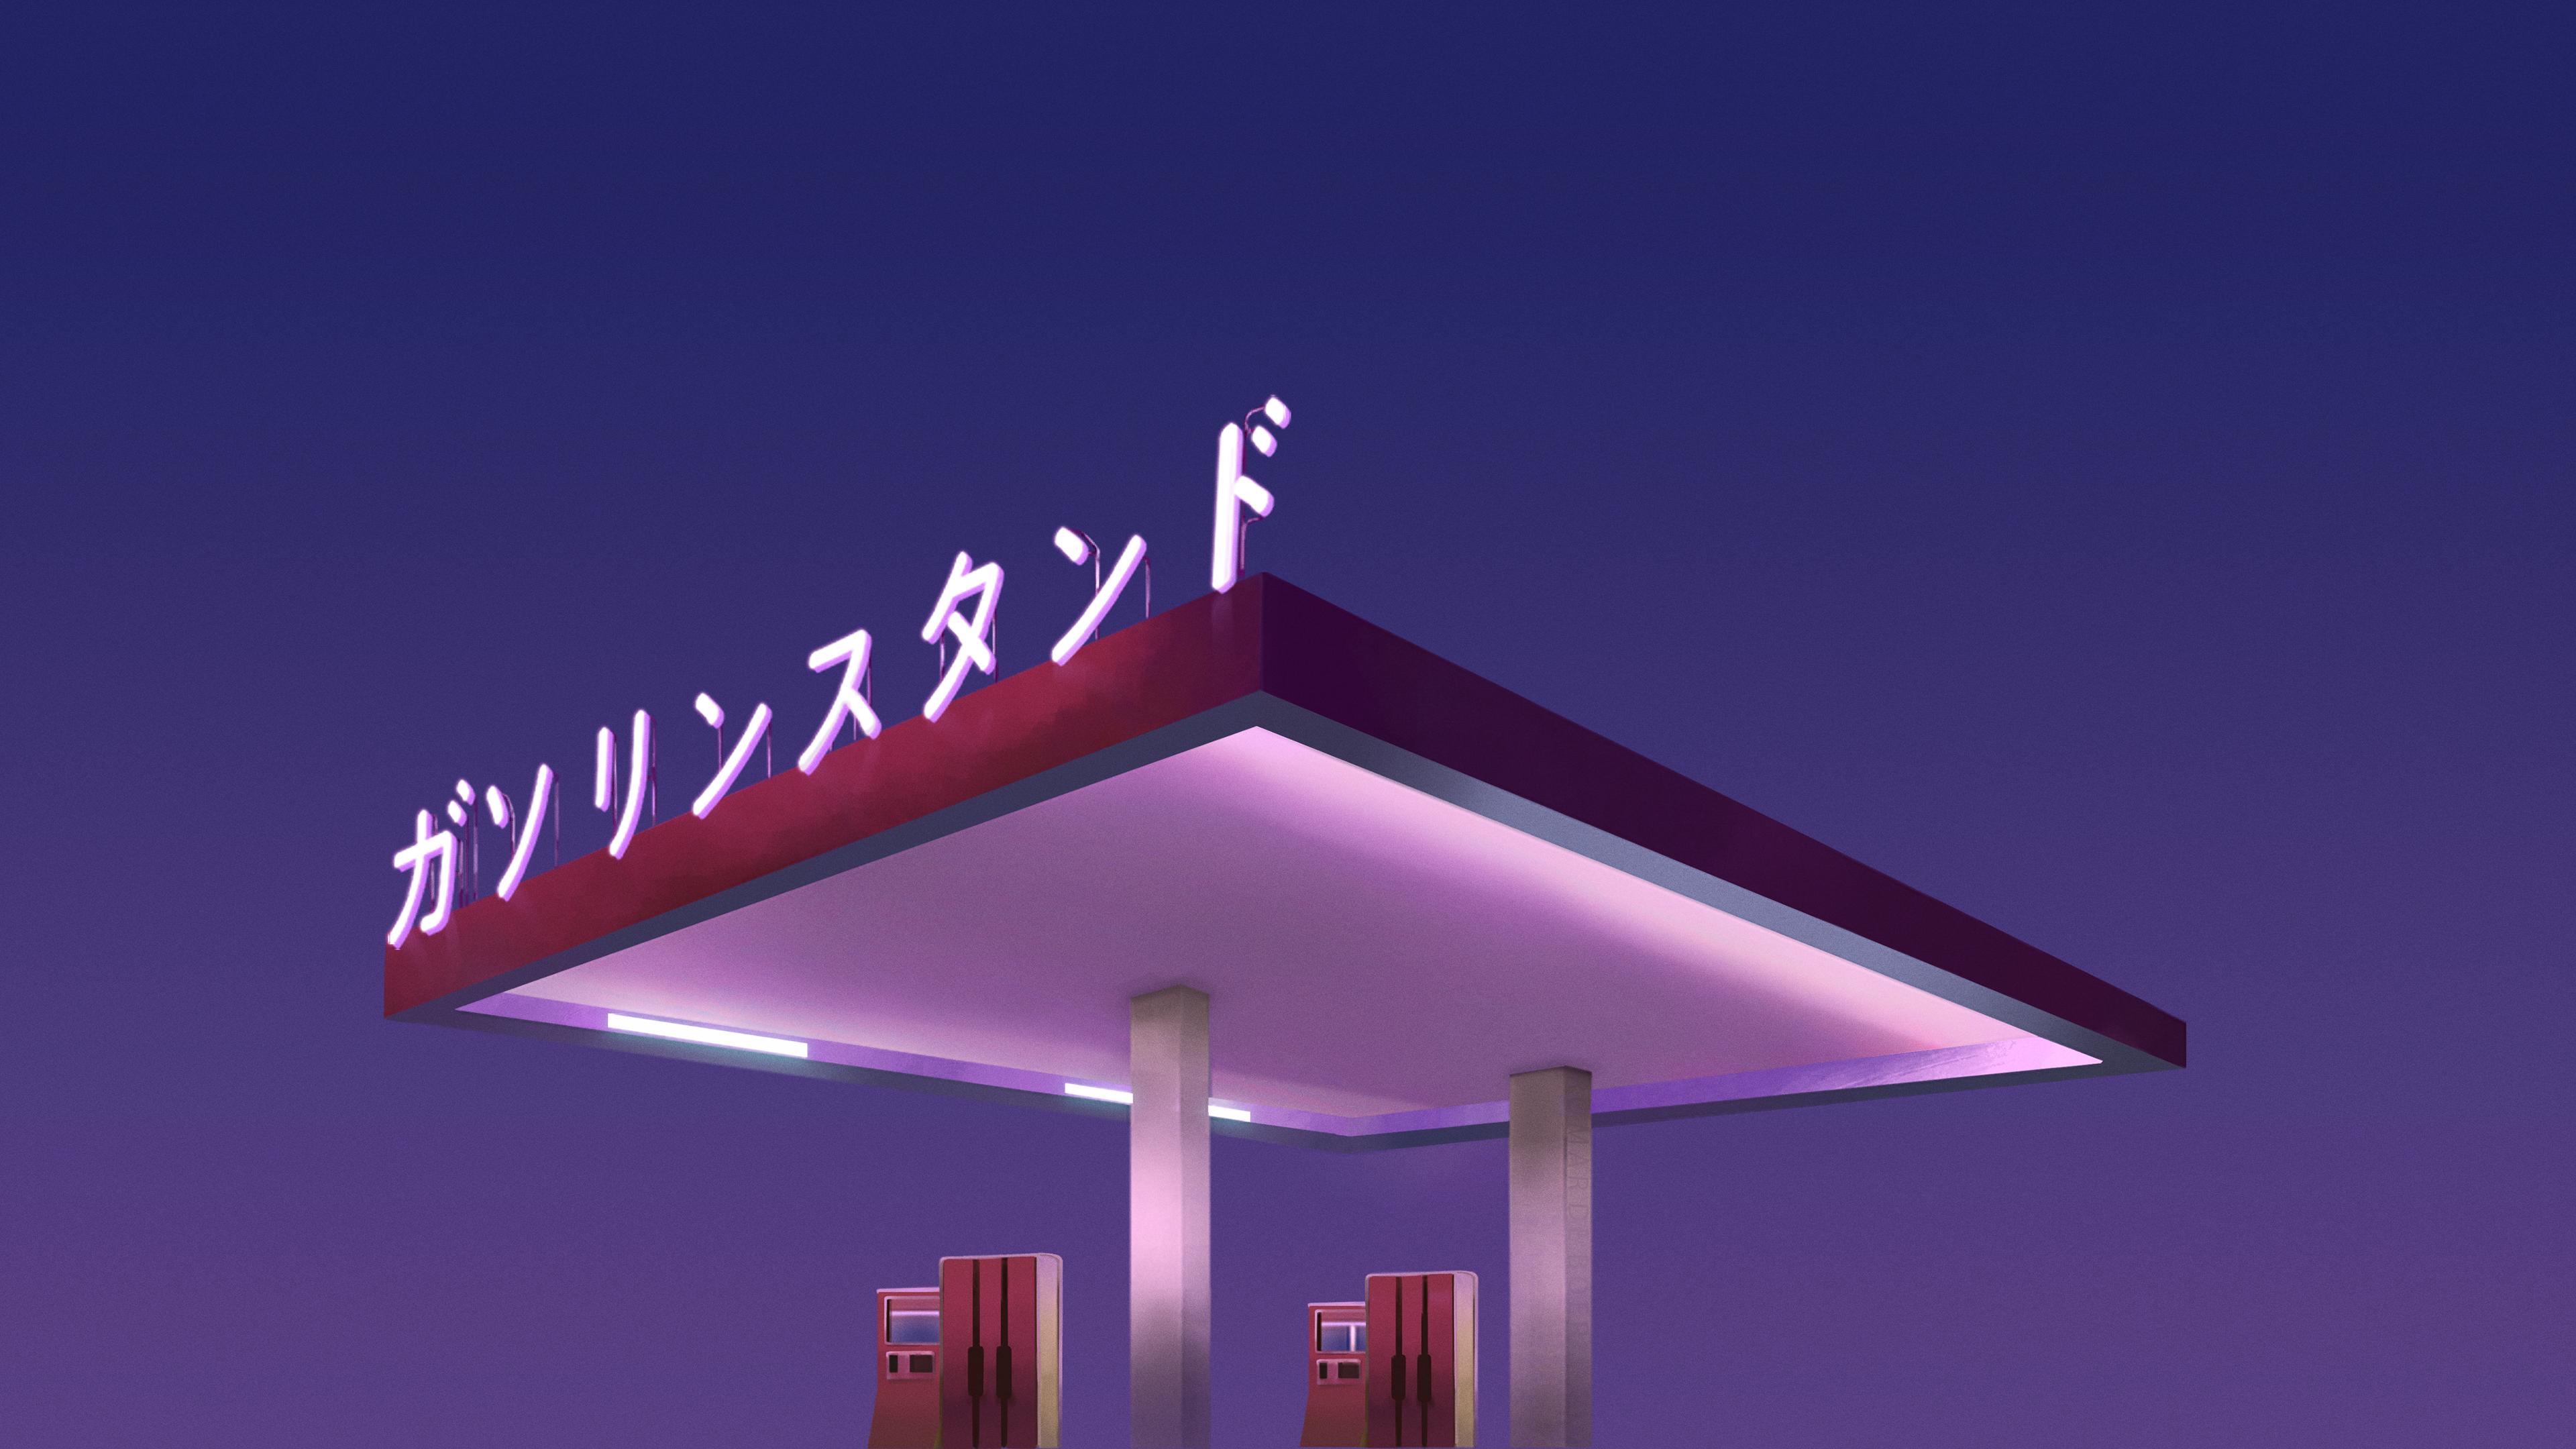 Wallpaper Seni Digital Gas Station Jepang Belanda Biru 3840x2160 Starbeat 1662151 Hd Wallpapers Wallhere